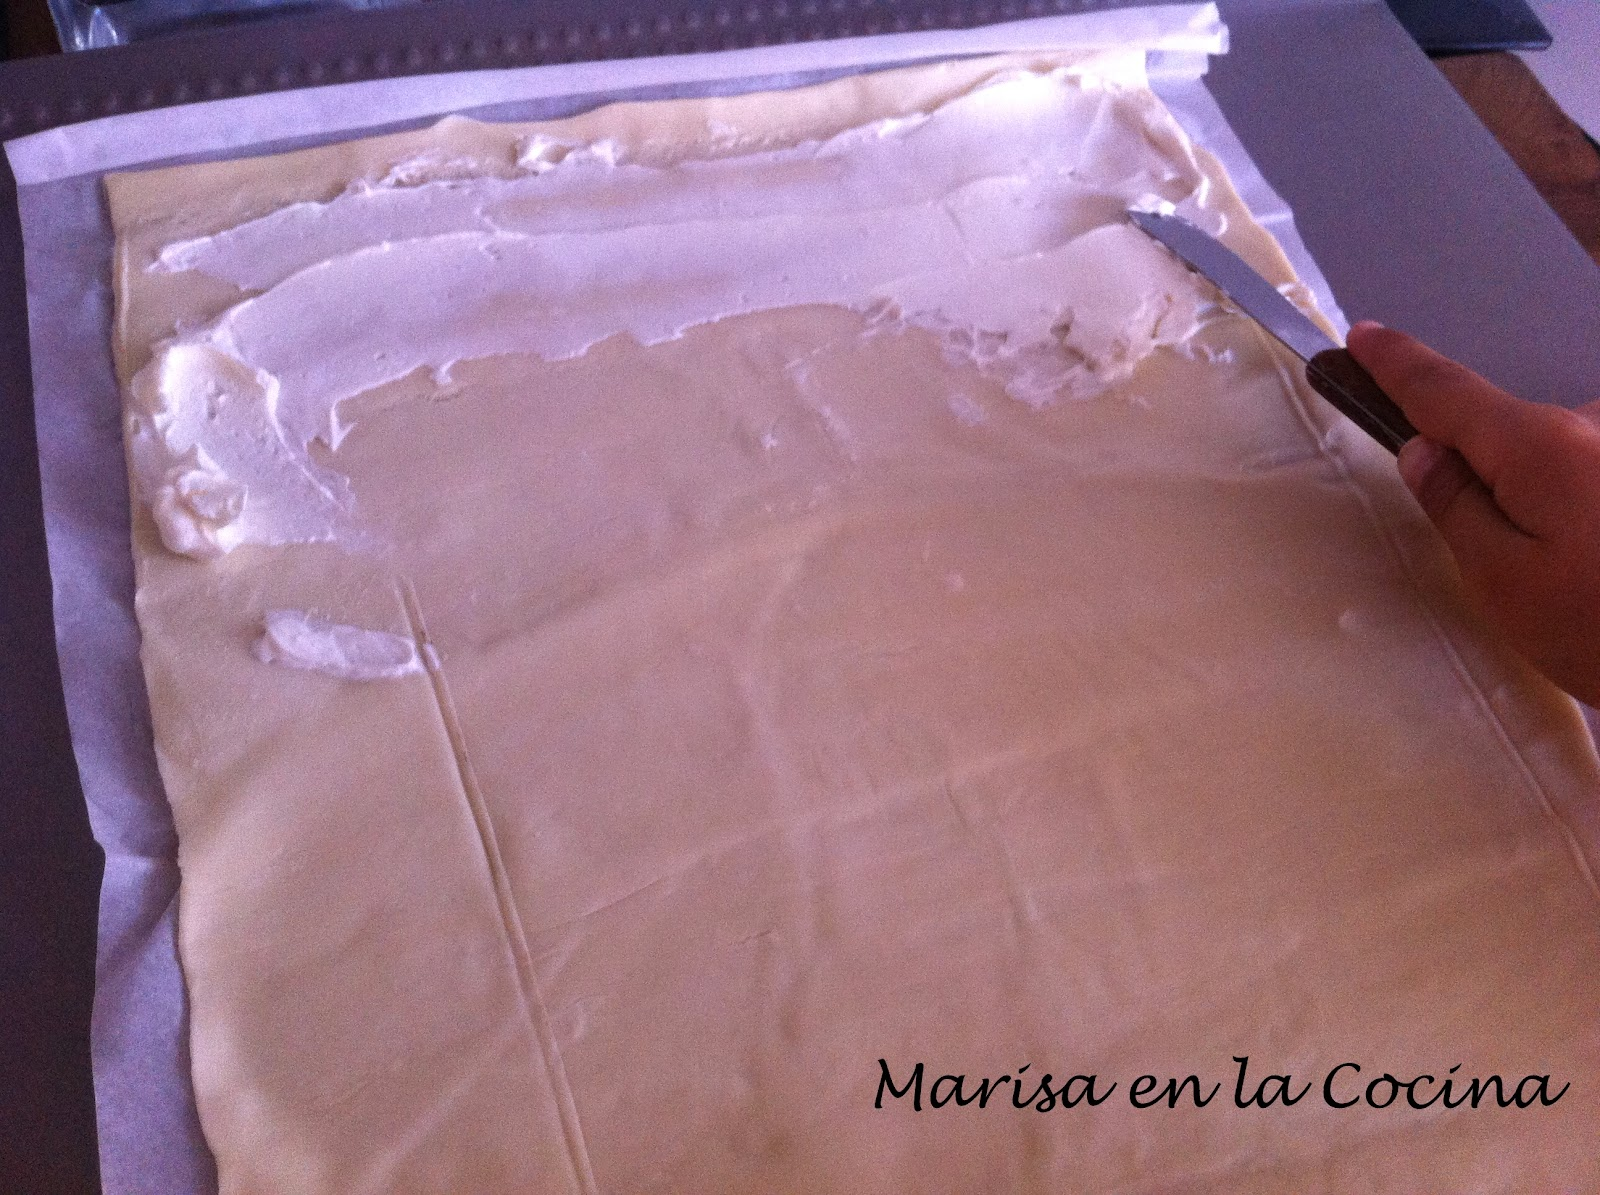 Naranjas bwin-übernahme droht doch noch zu platzen | lettertest.de y Limones: Cesta Founde/ Cesta de frutas con chocolate